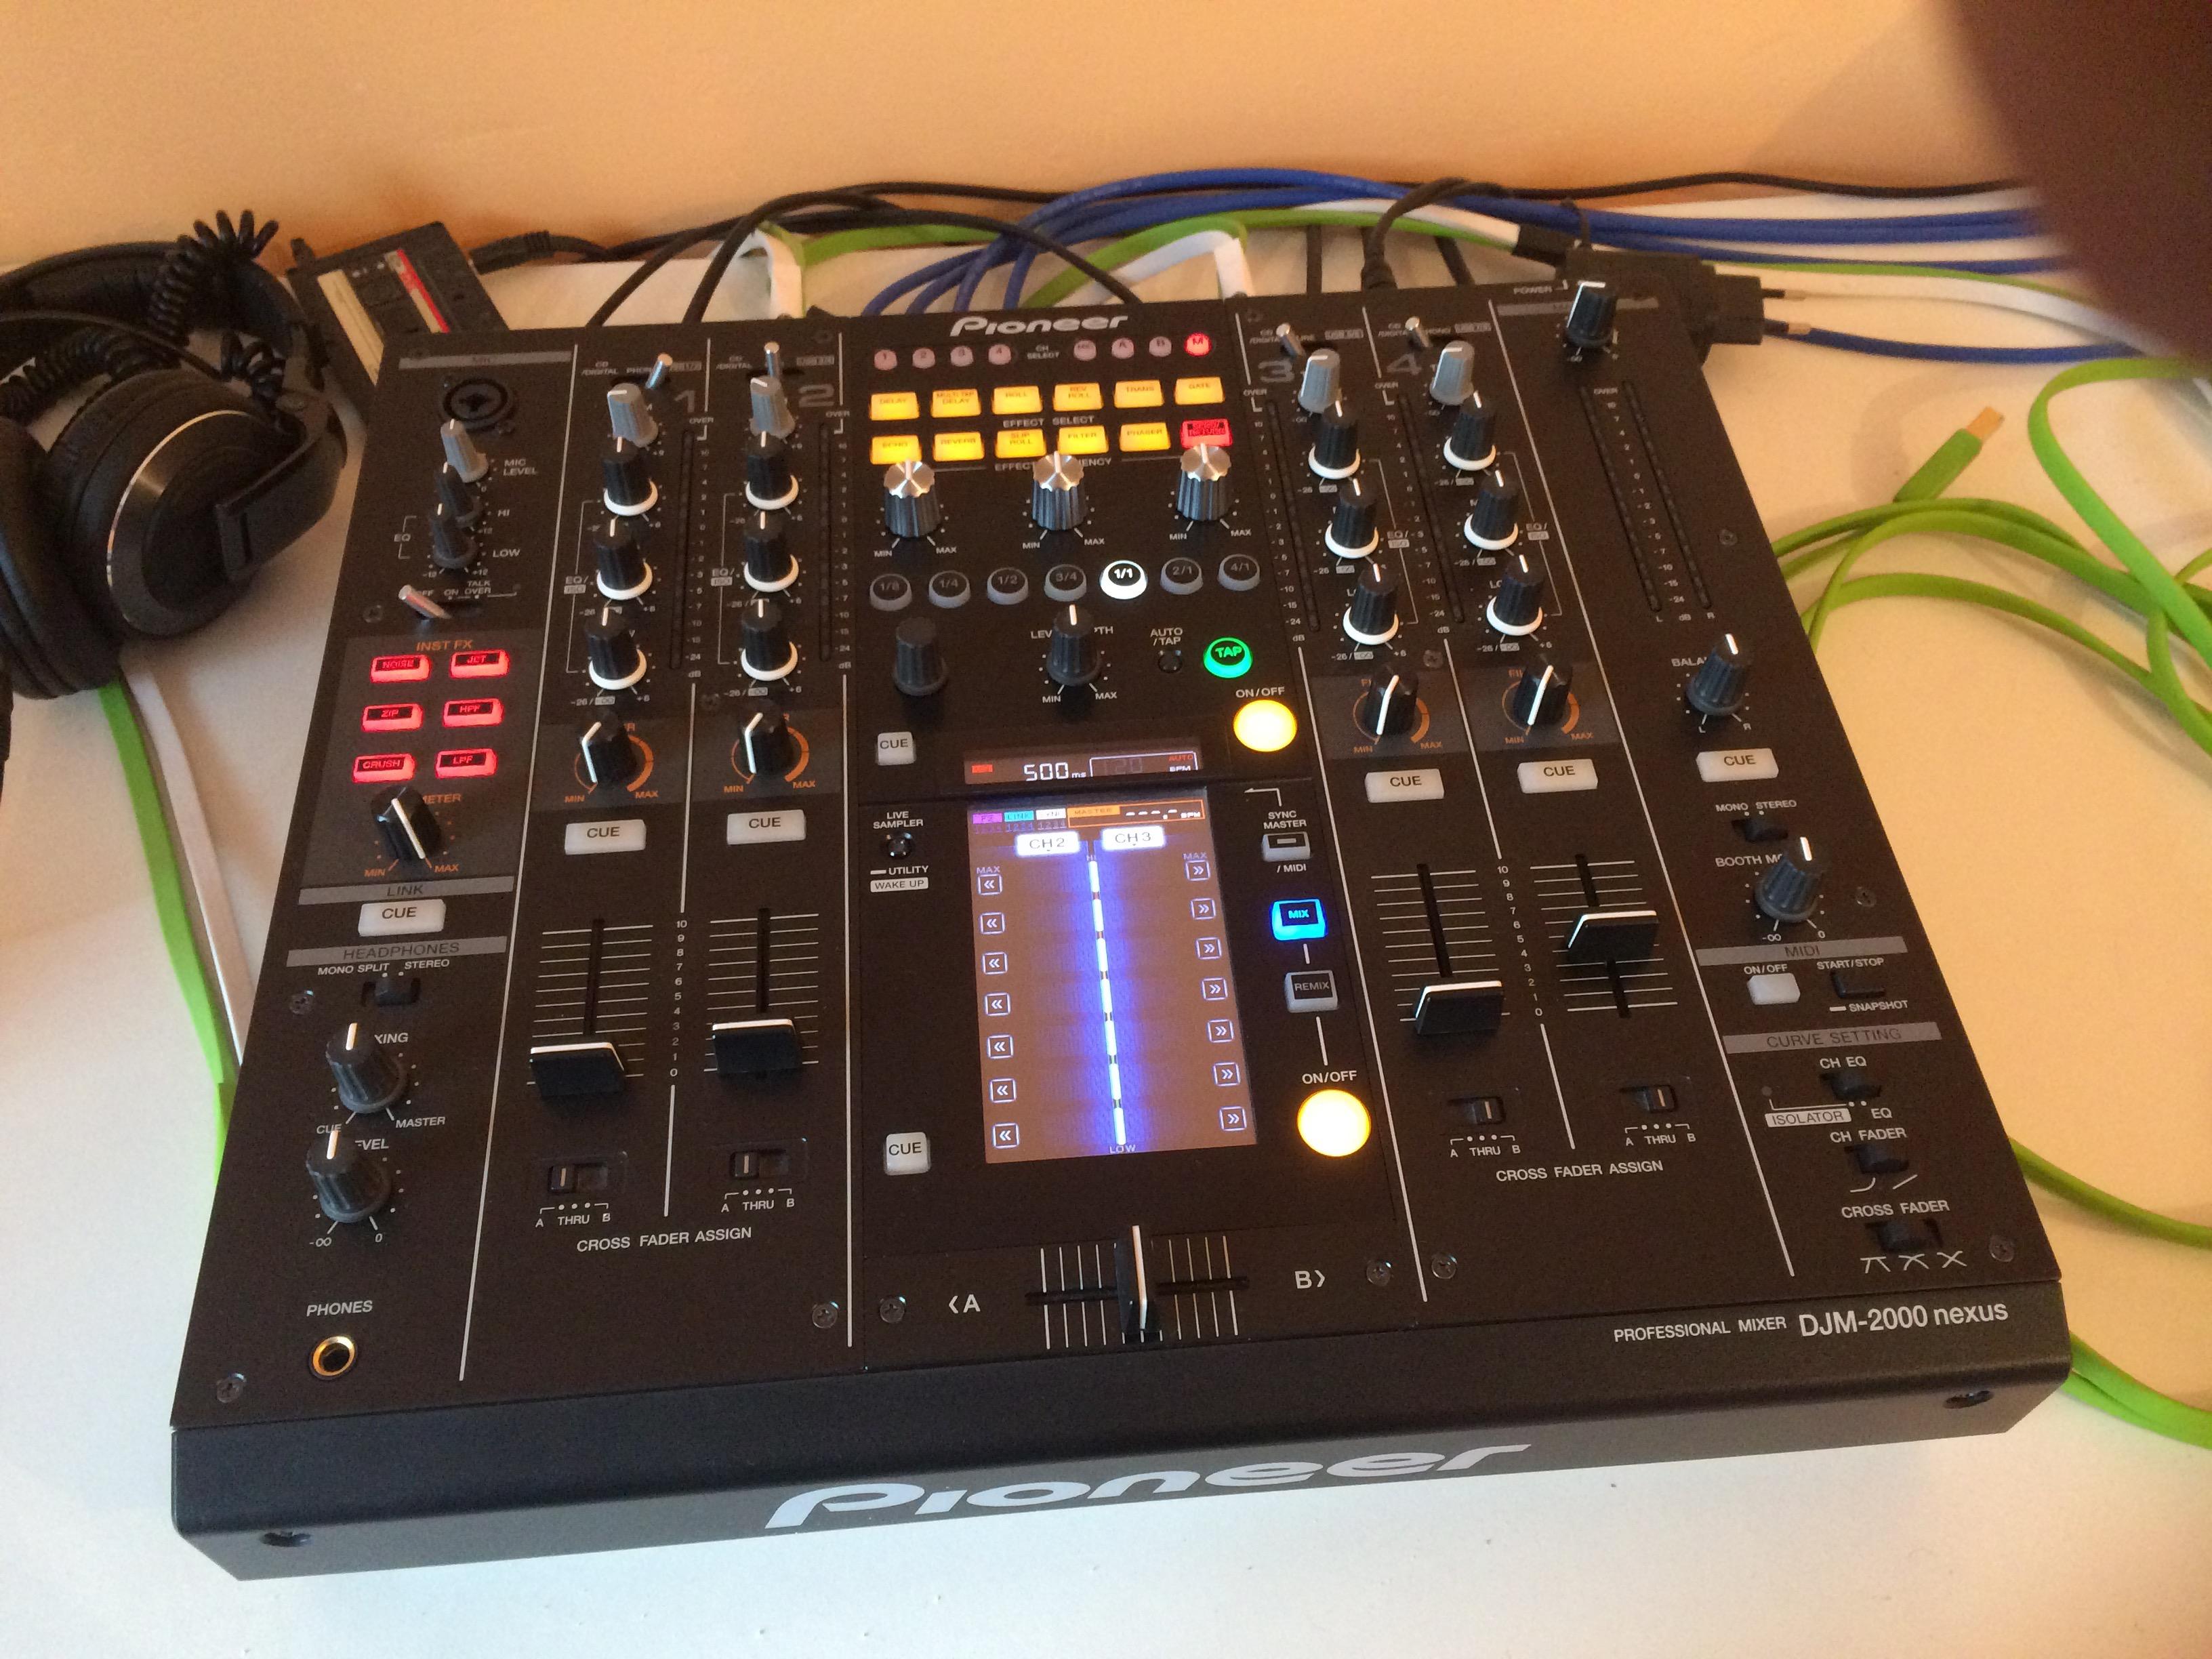 Vends table de mixage pioneer djm 2000 nexus languedoc - Table de mixage pioneer djm 2000 ...